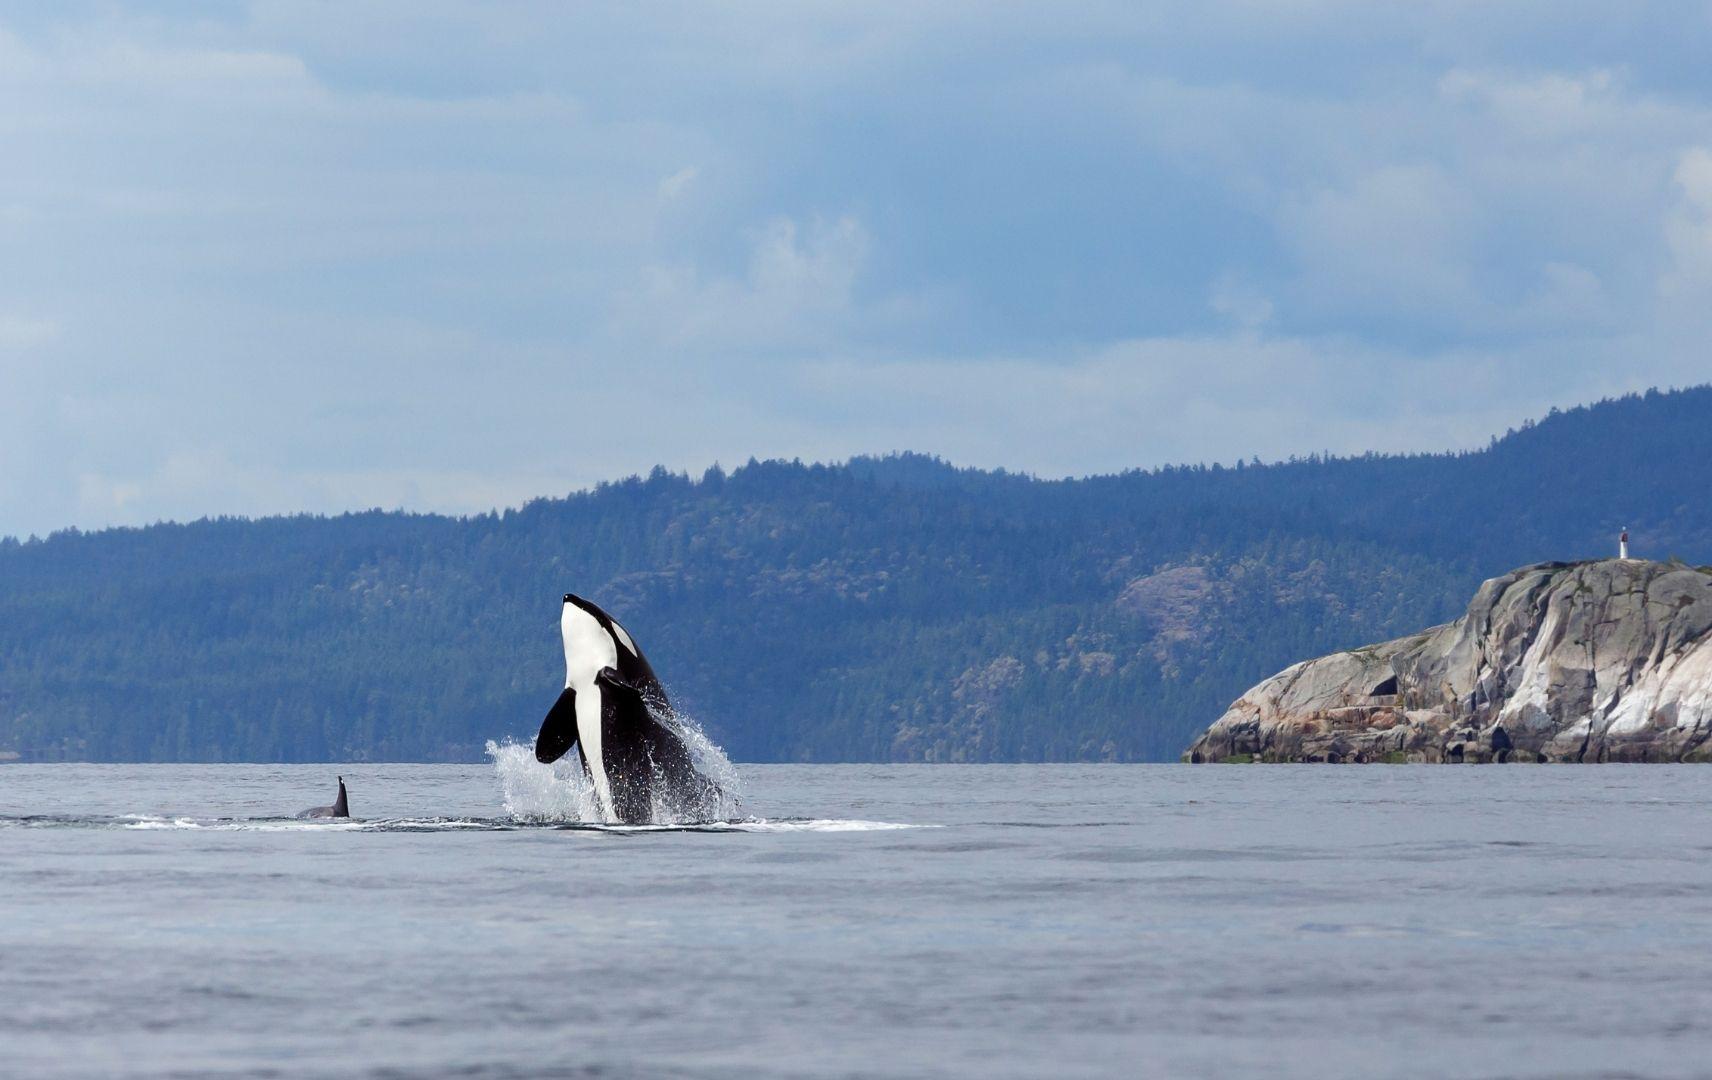 Reiseziel Südamerika - Orka Wal